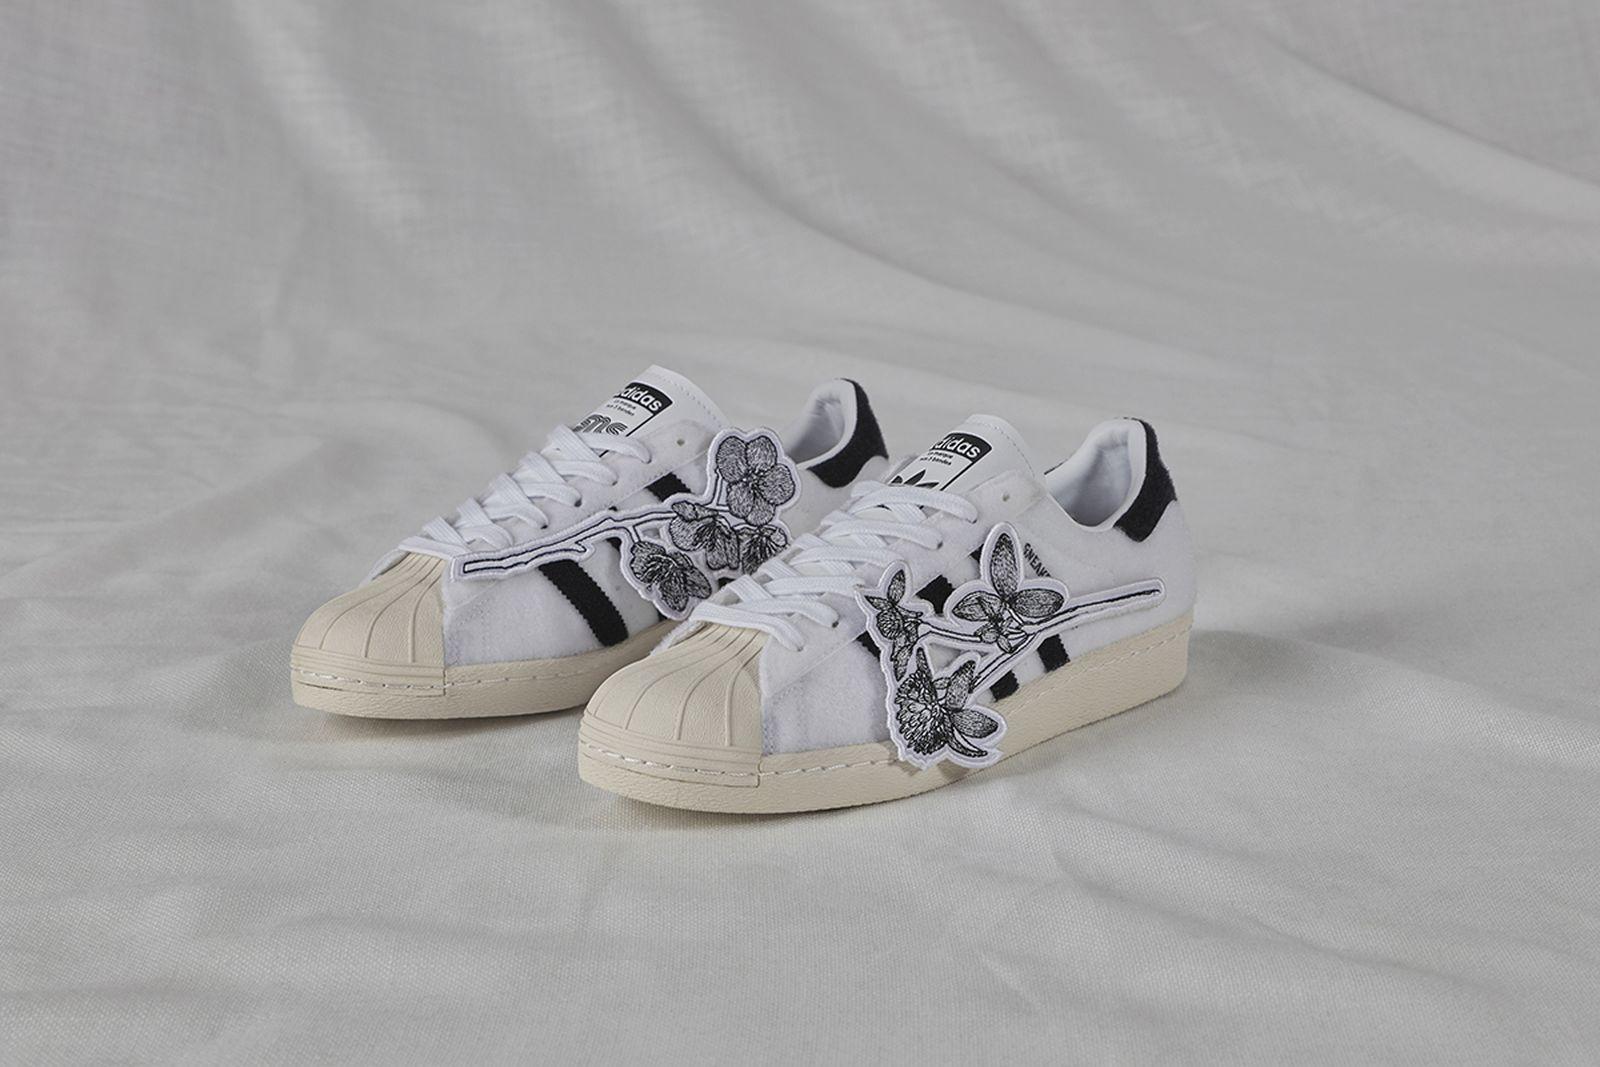 sns-kazuki-kuraishi-adidas-superstar-release-date-price-08